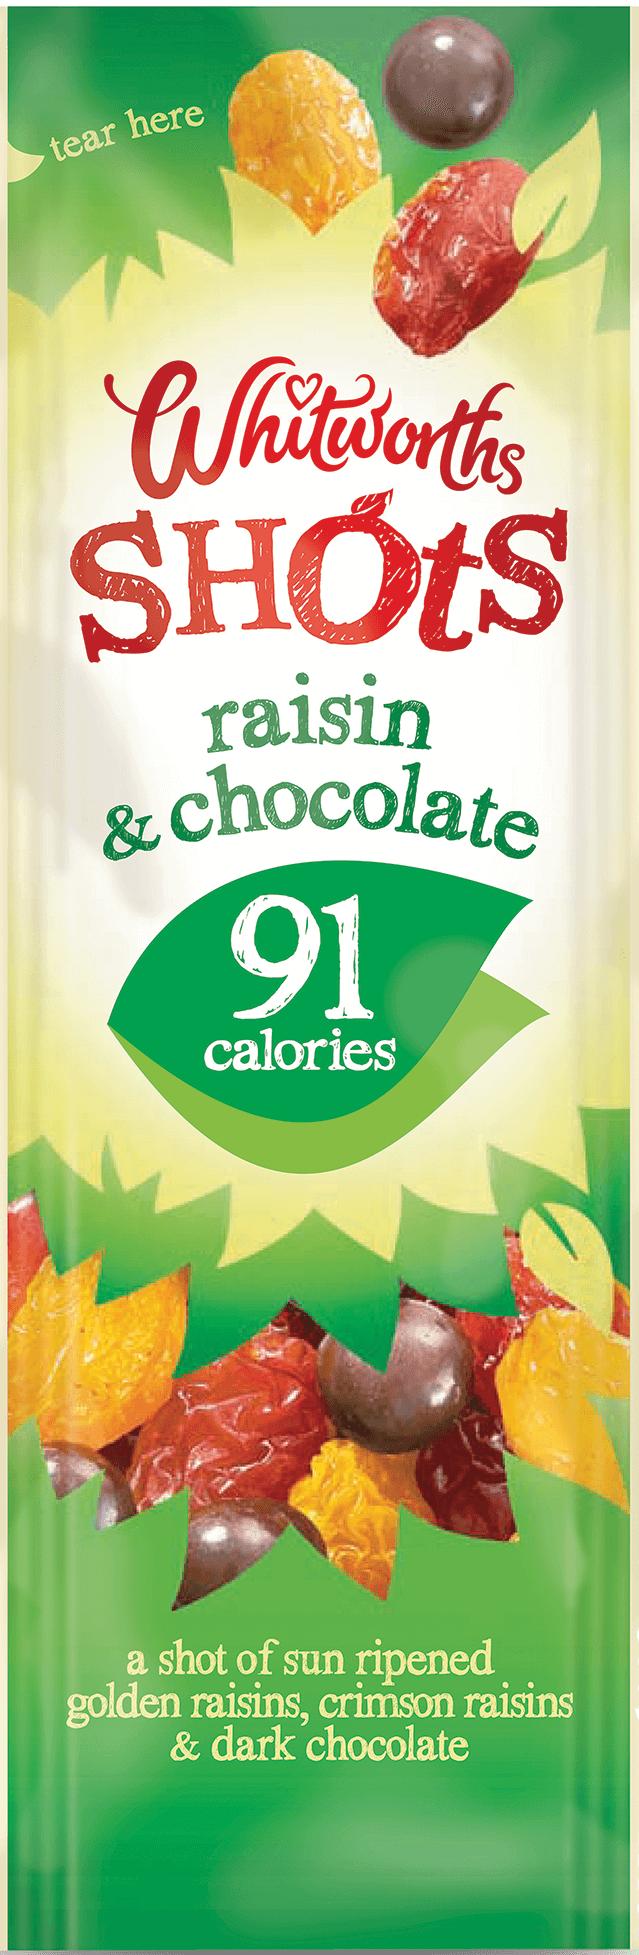 Whitworths Shots - Raisin & Chocolate (91 calories)